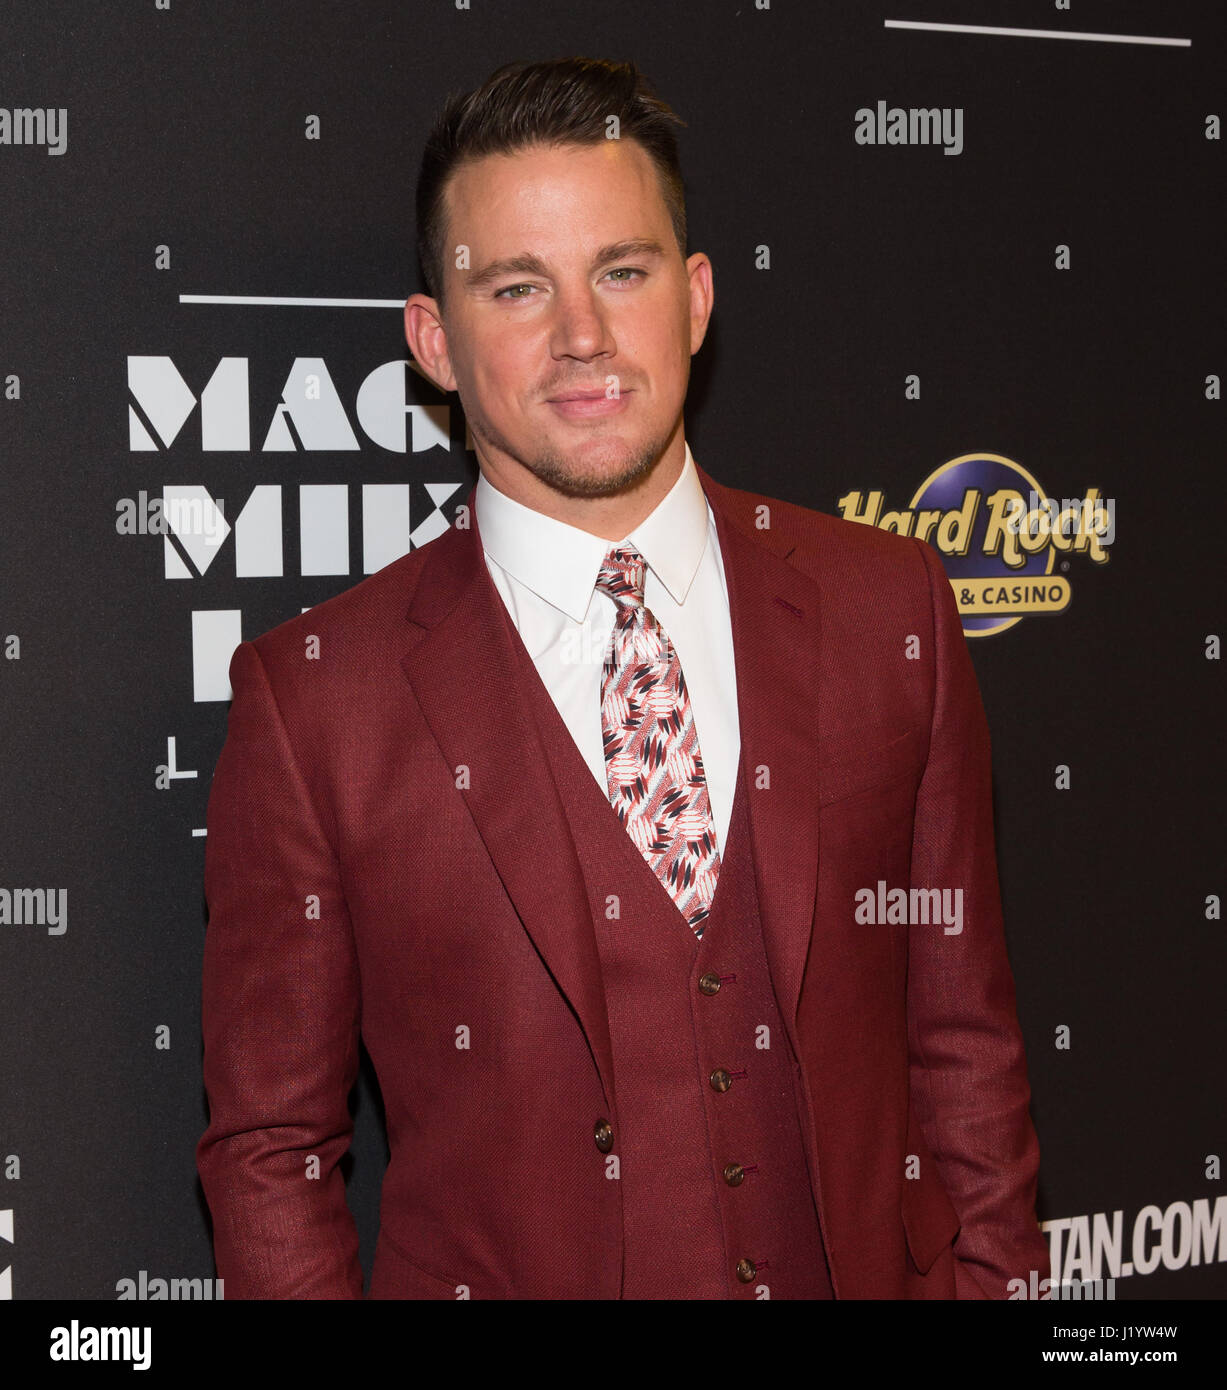 Las Vegas, NV, USA. 21. April 2017. MAGIC MIKE LIVE LAS VEGAS Co-Regisseur und Produzent Channing Tatum am Eröffnungsabend Stockbild